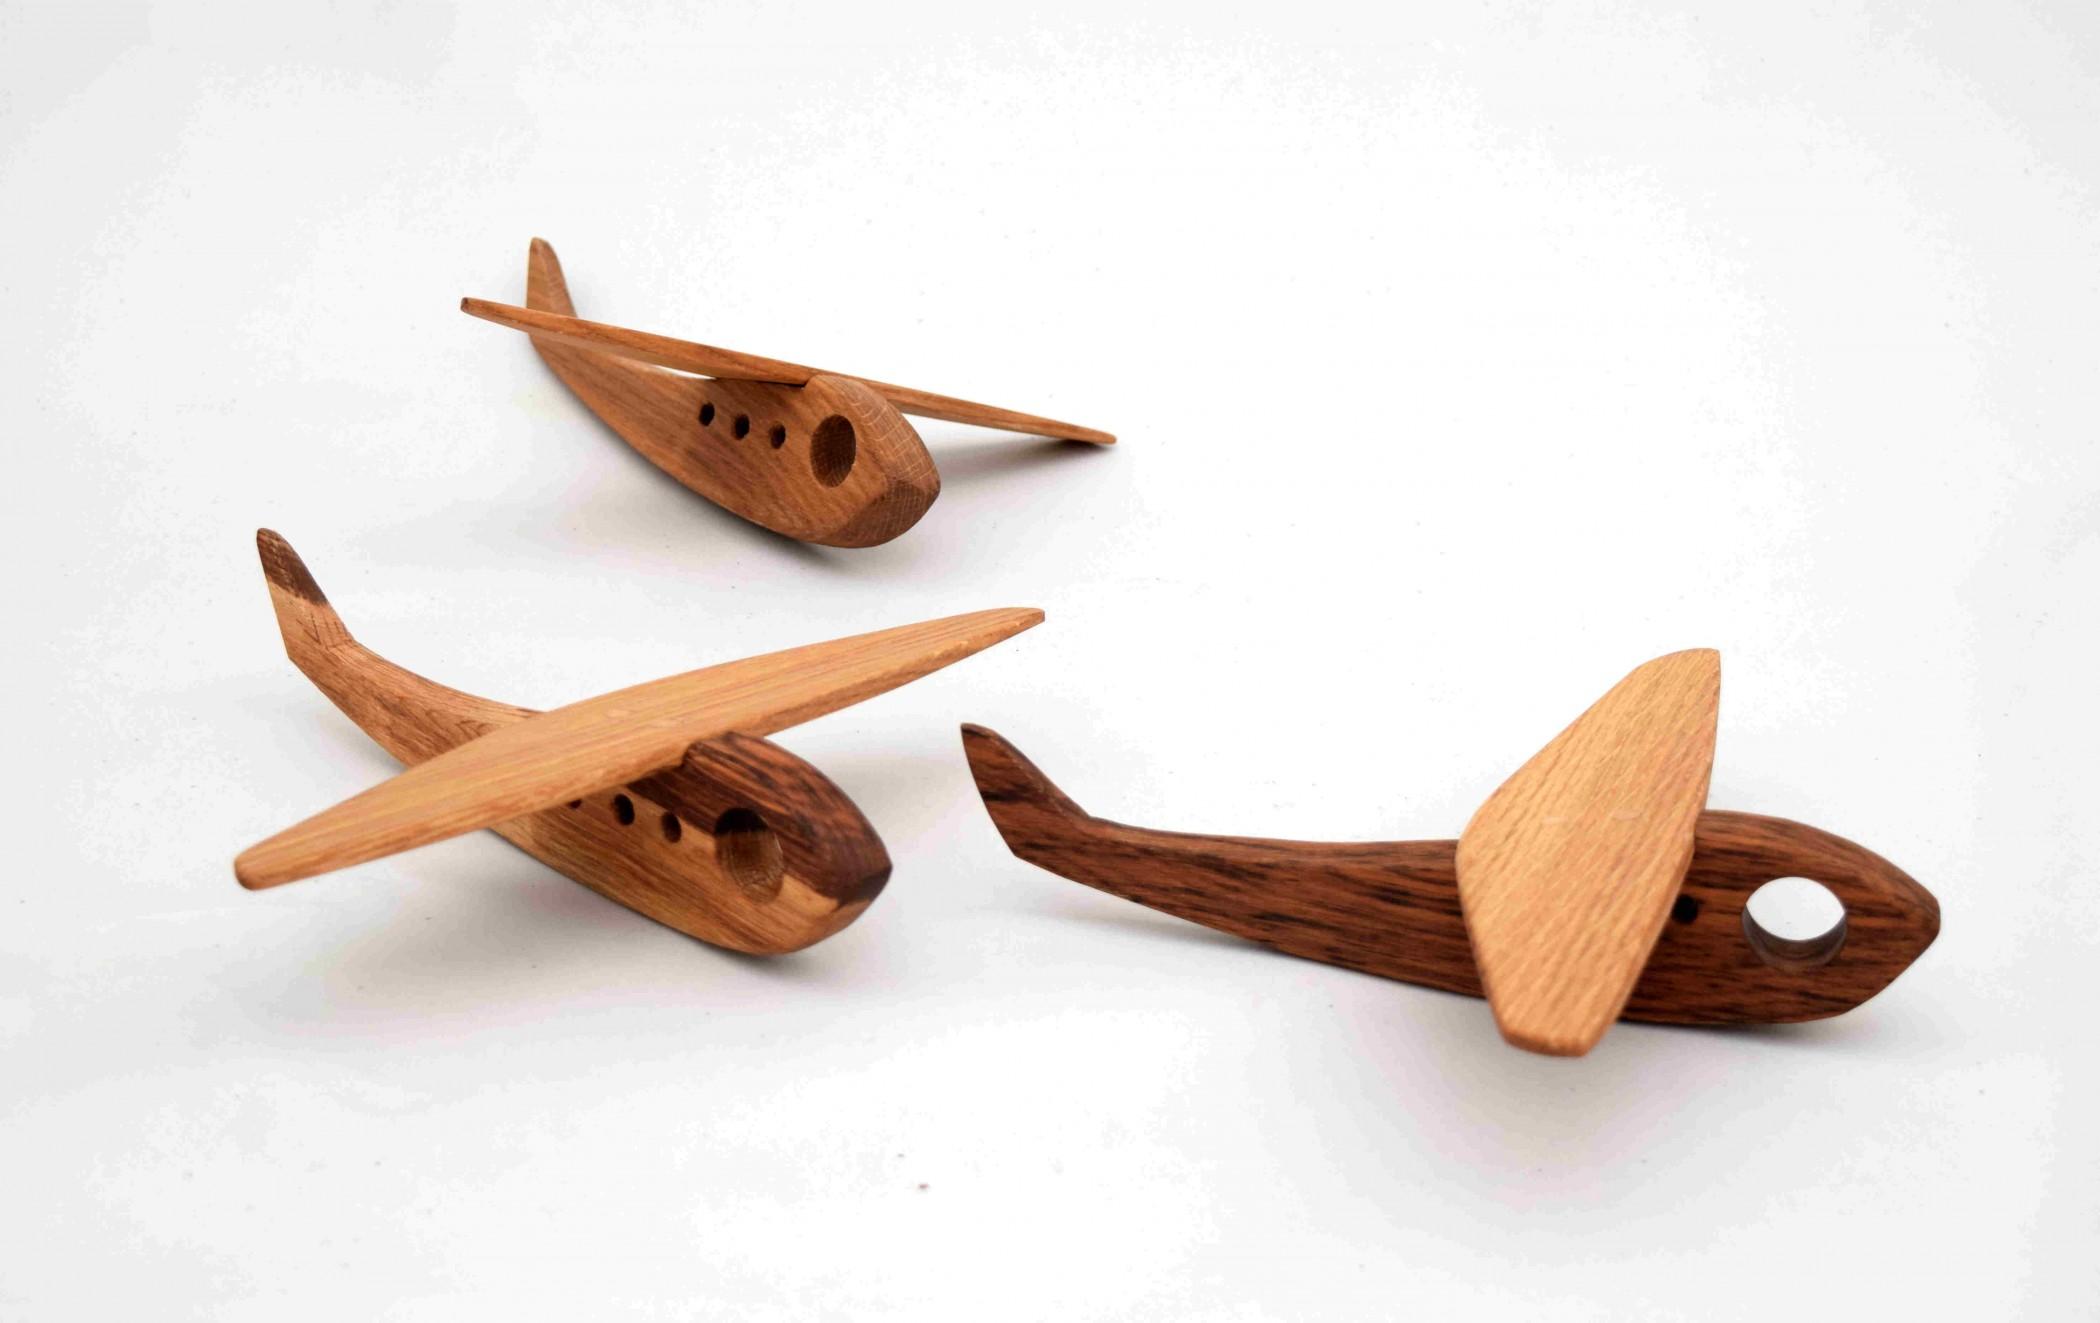 jouets et objets en bois goupil pierre. Black Bedroom Furniture Sets. Home Design Ideas